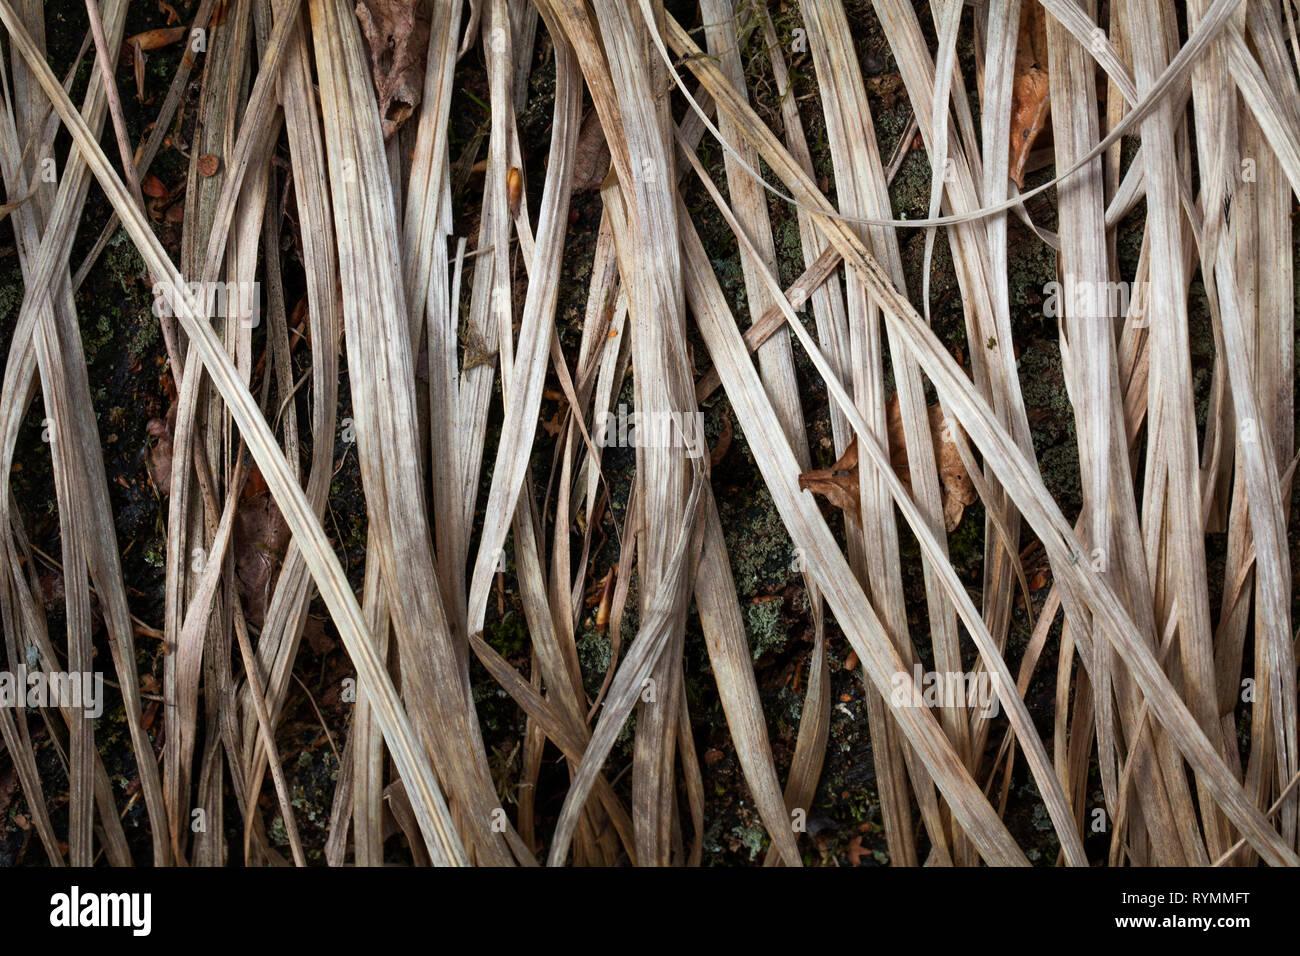 Strukturen in trockenes Gras, Nahaufnahme Stockbild